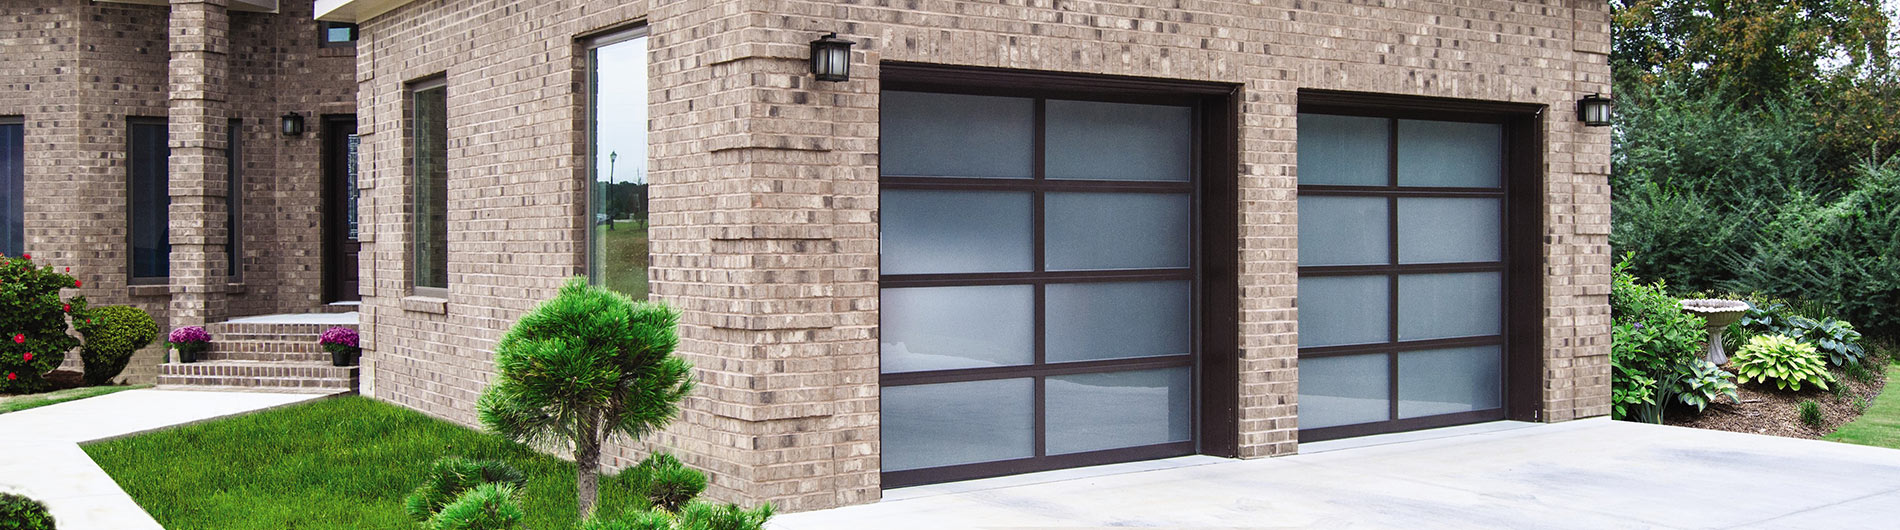 Aluminum Glass Garage Doors 8850